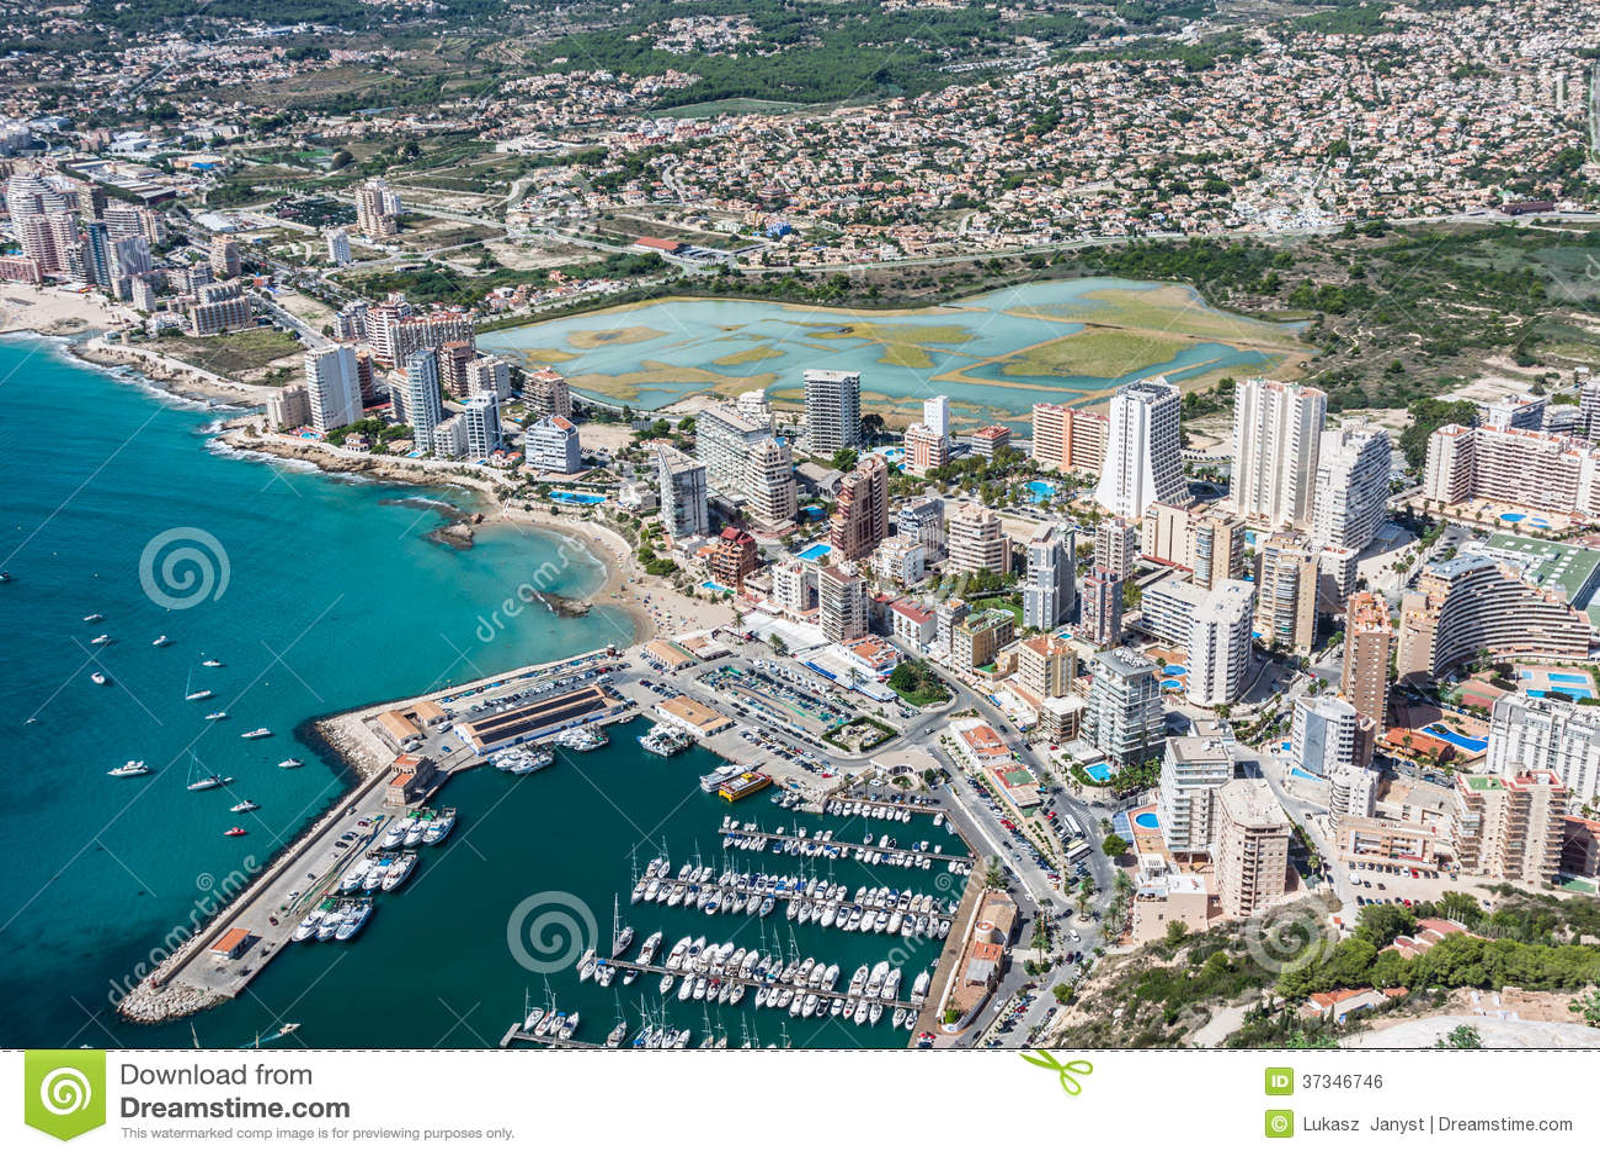 Hoge hoekmening van de jachthaven in Calpe, Alicante, Spanje